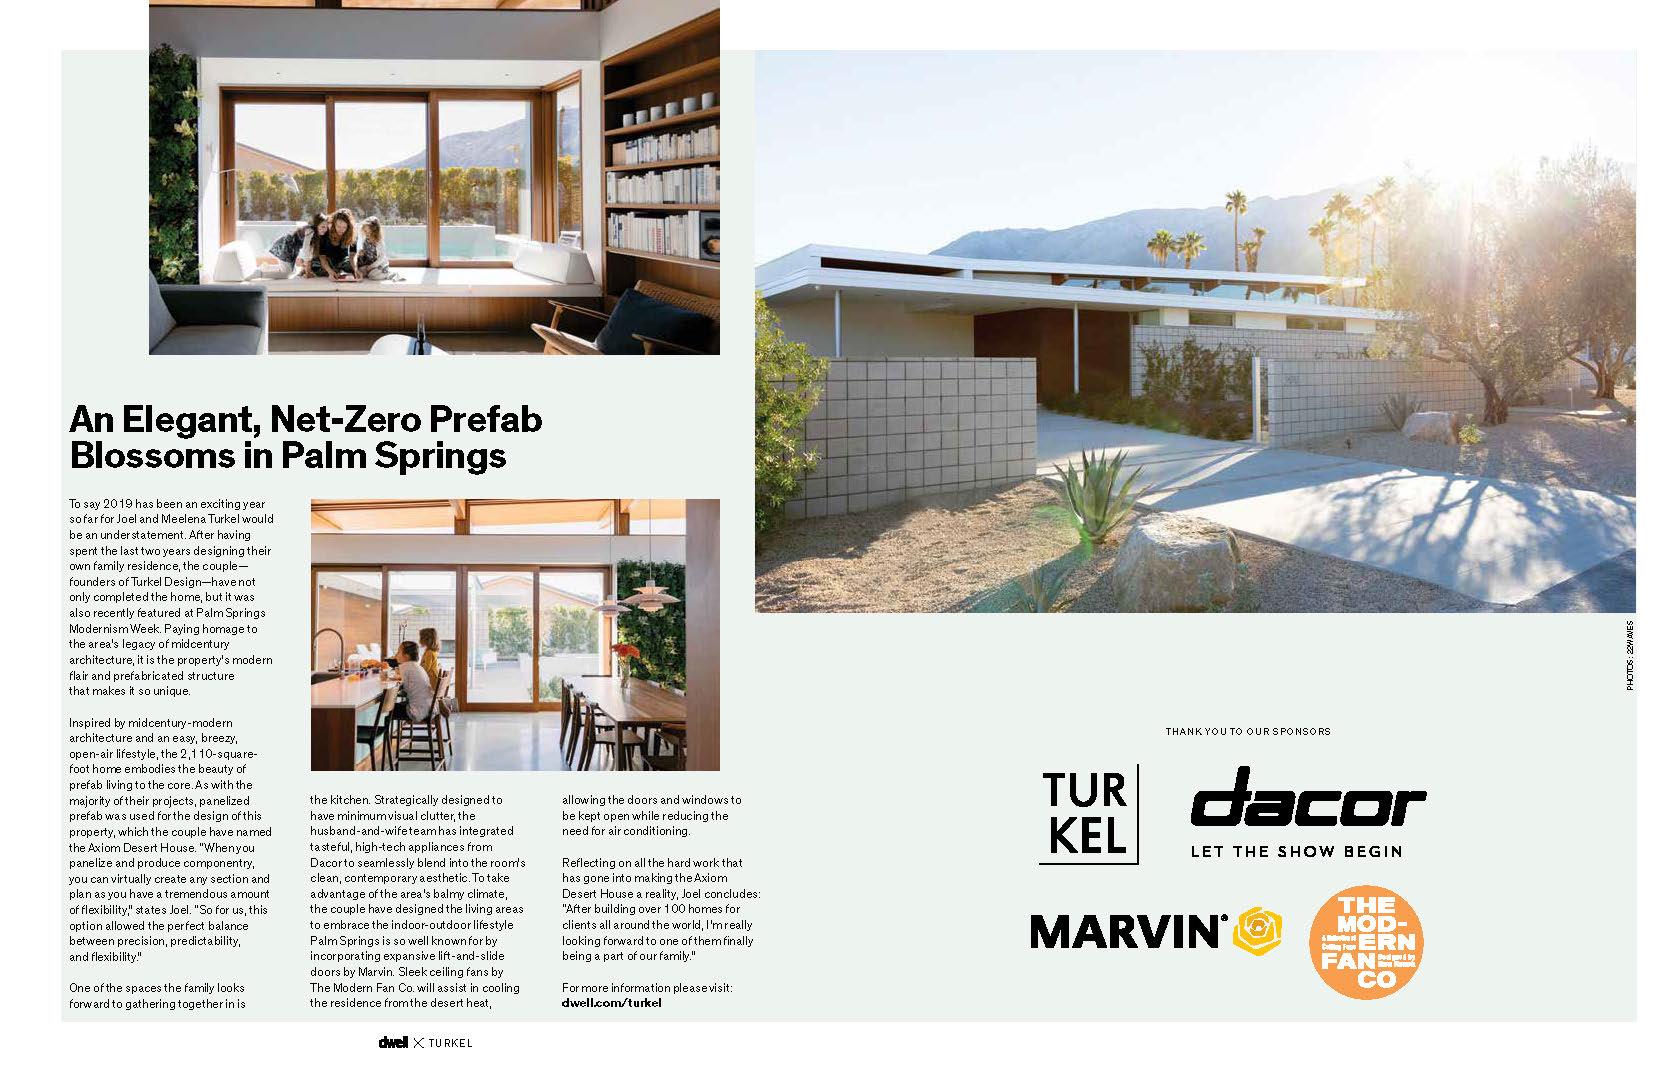 turkel_design_modern_prefab_home_axiomdeserthouse_dwell_mayjune2019.jpeg